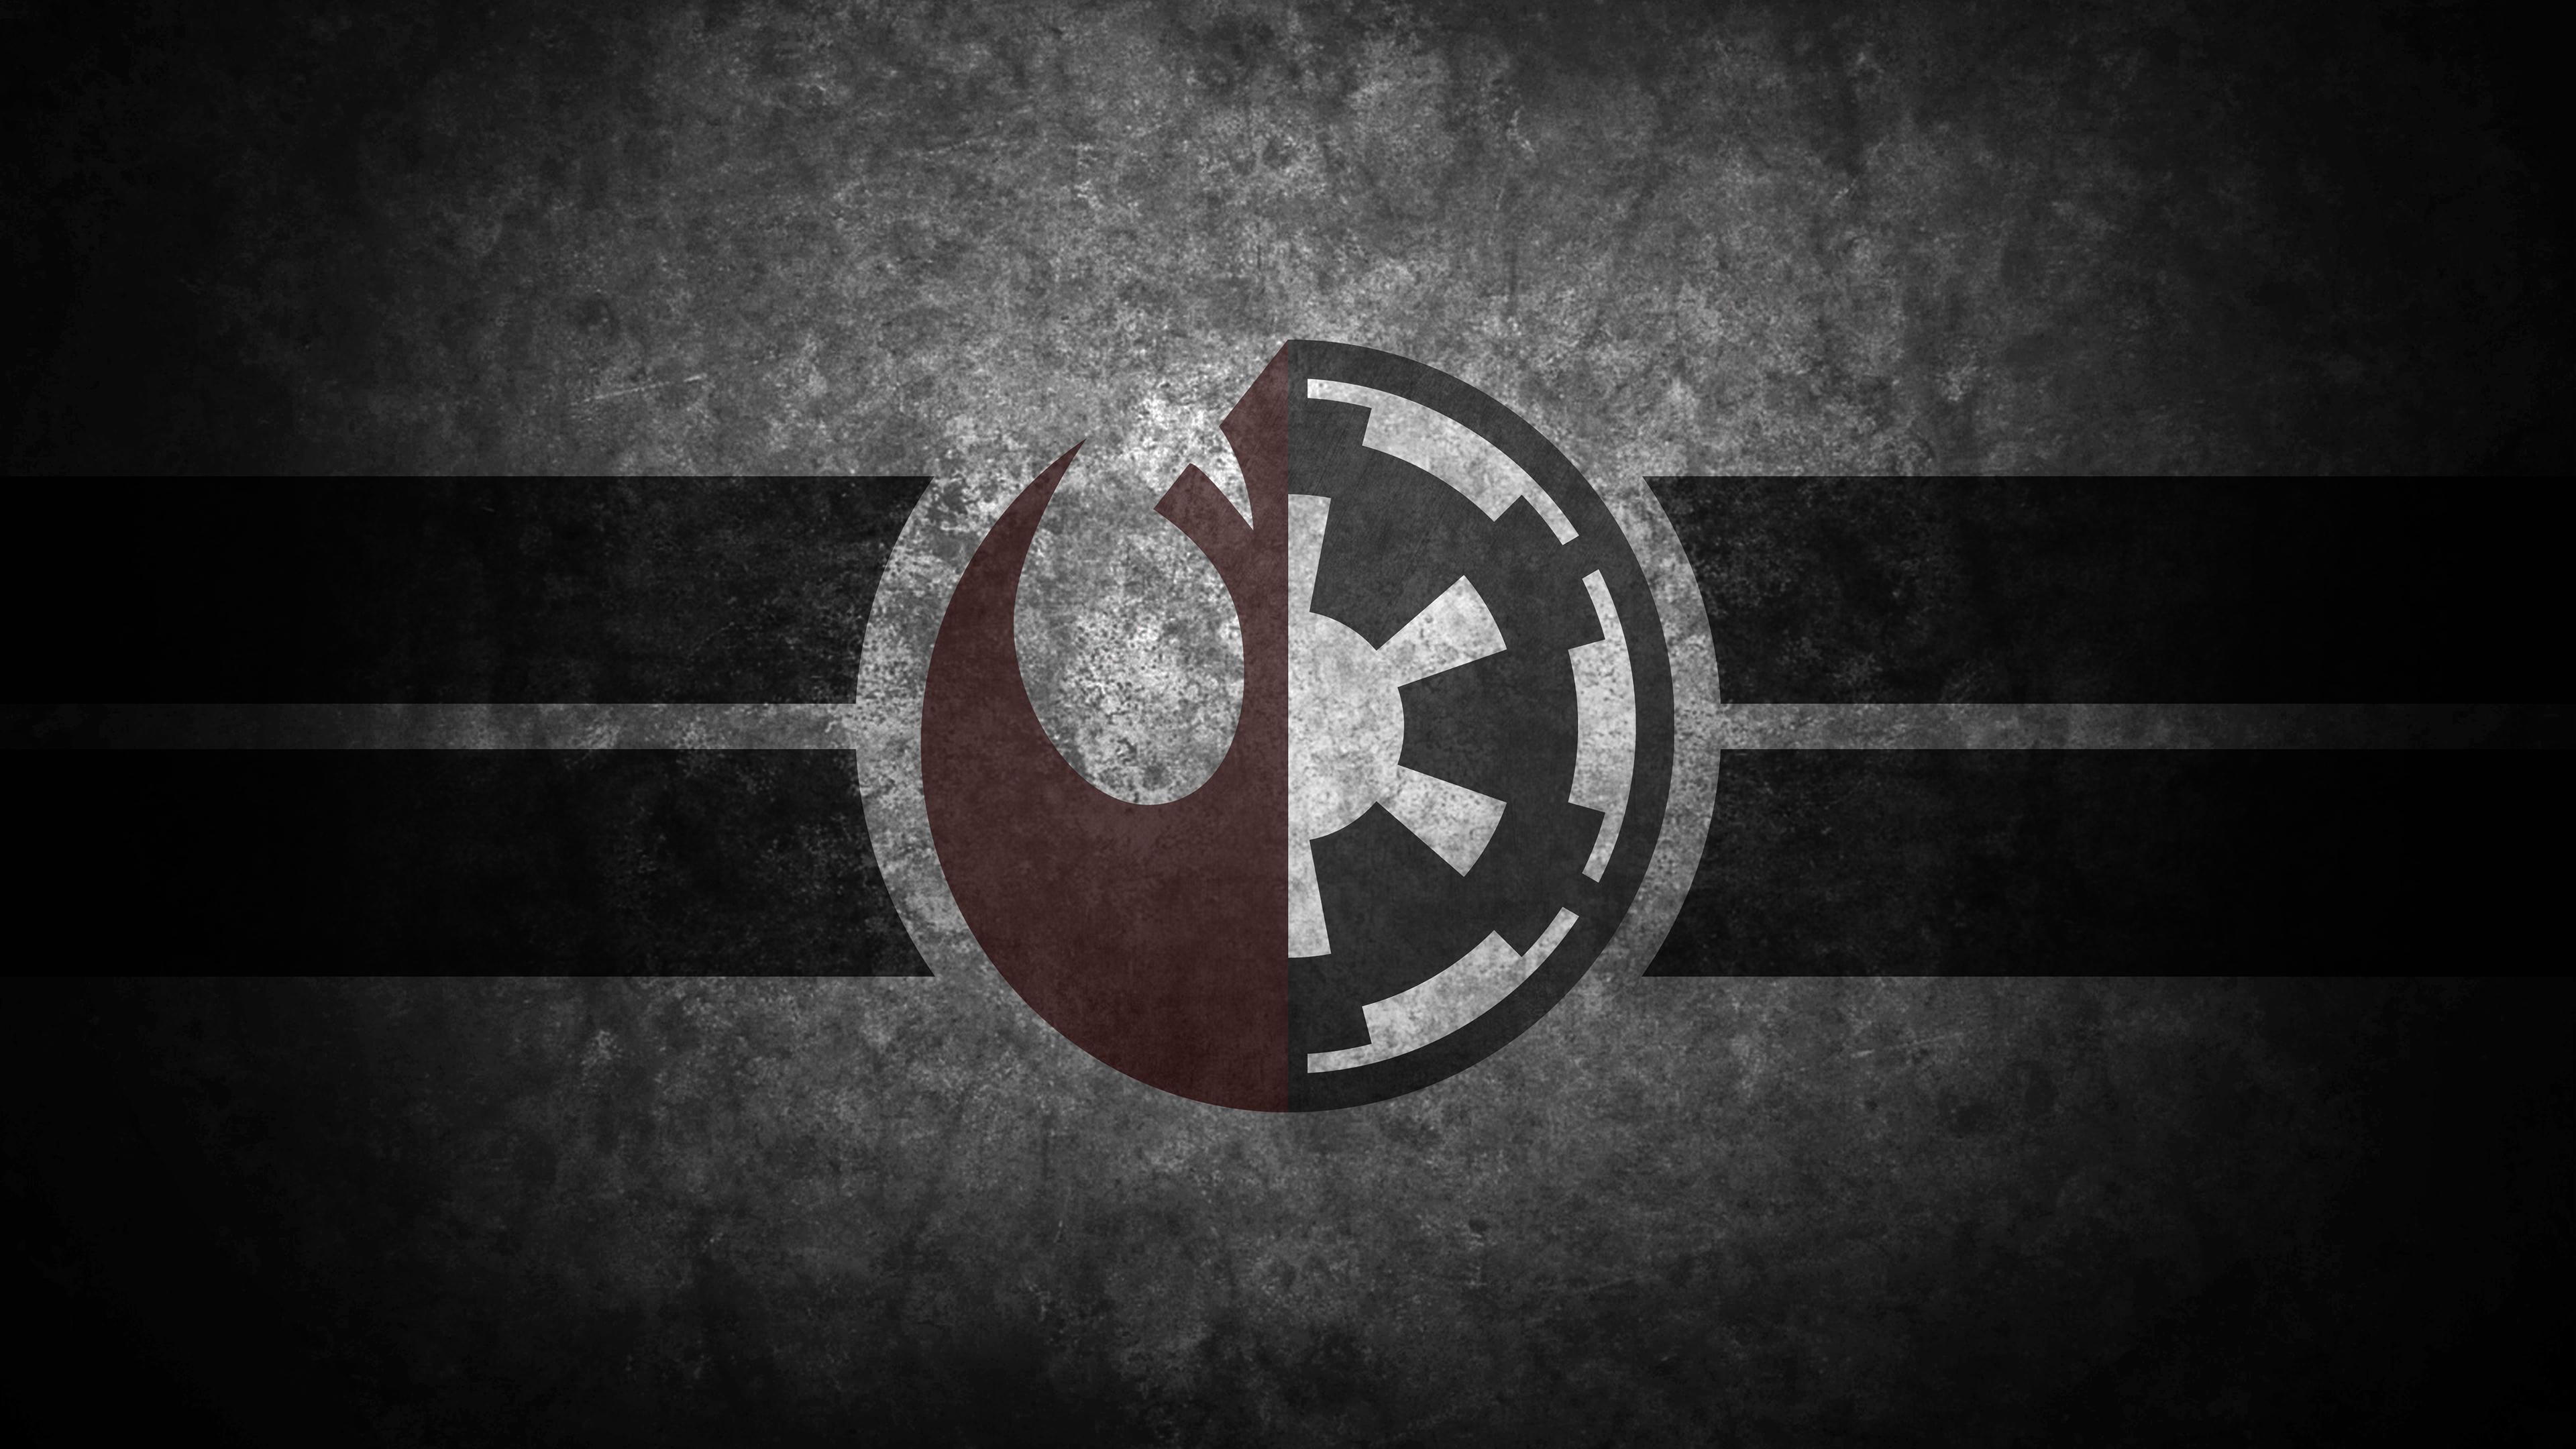 Star Wars Divided Allegiance Desktop Wallpaper By Swmand4 On Deviantart